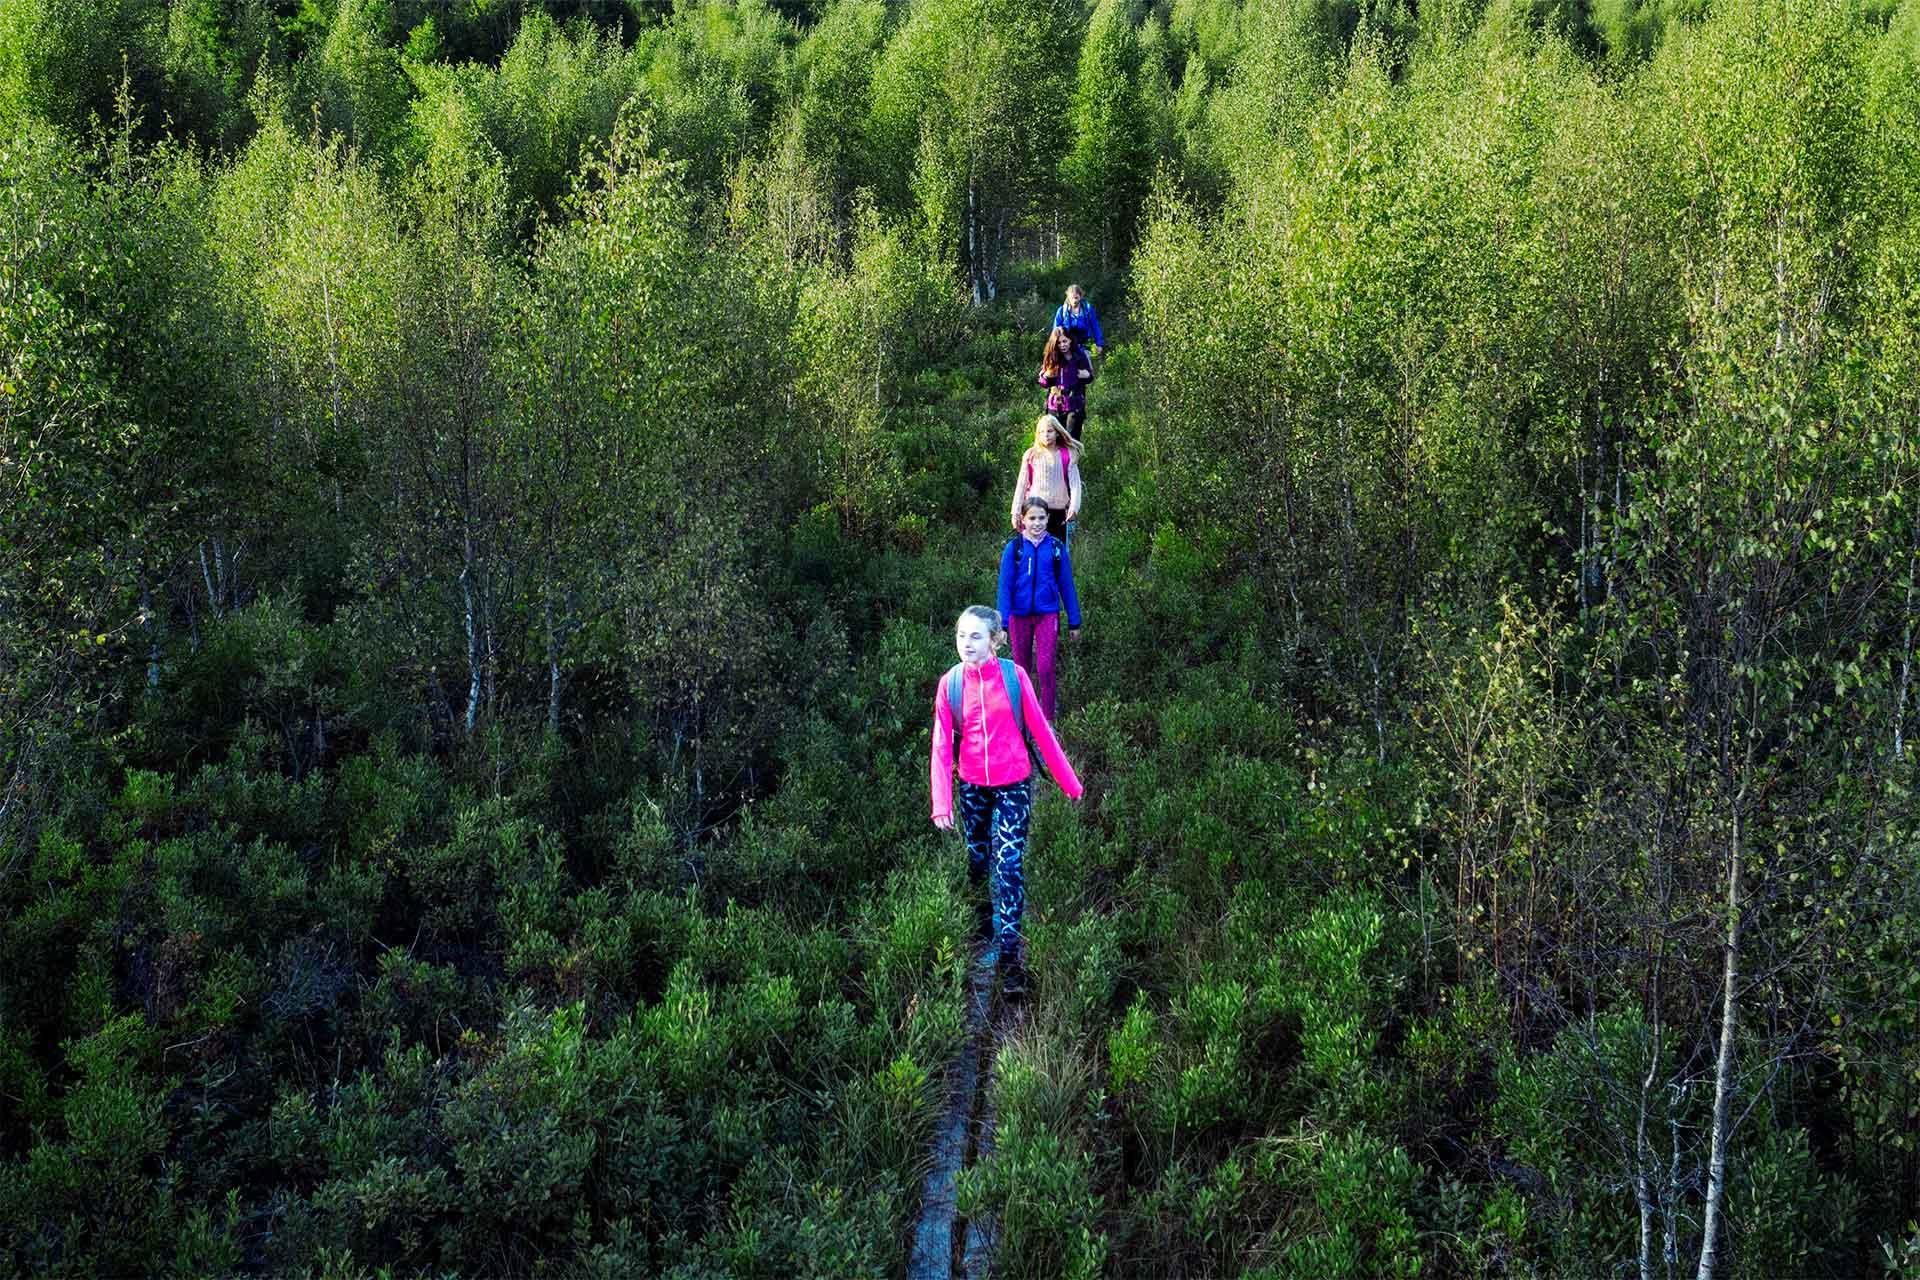 Ungdomar som vandrar på en spång i skogen. Foto: Roger Borgelid.